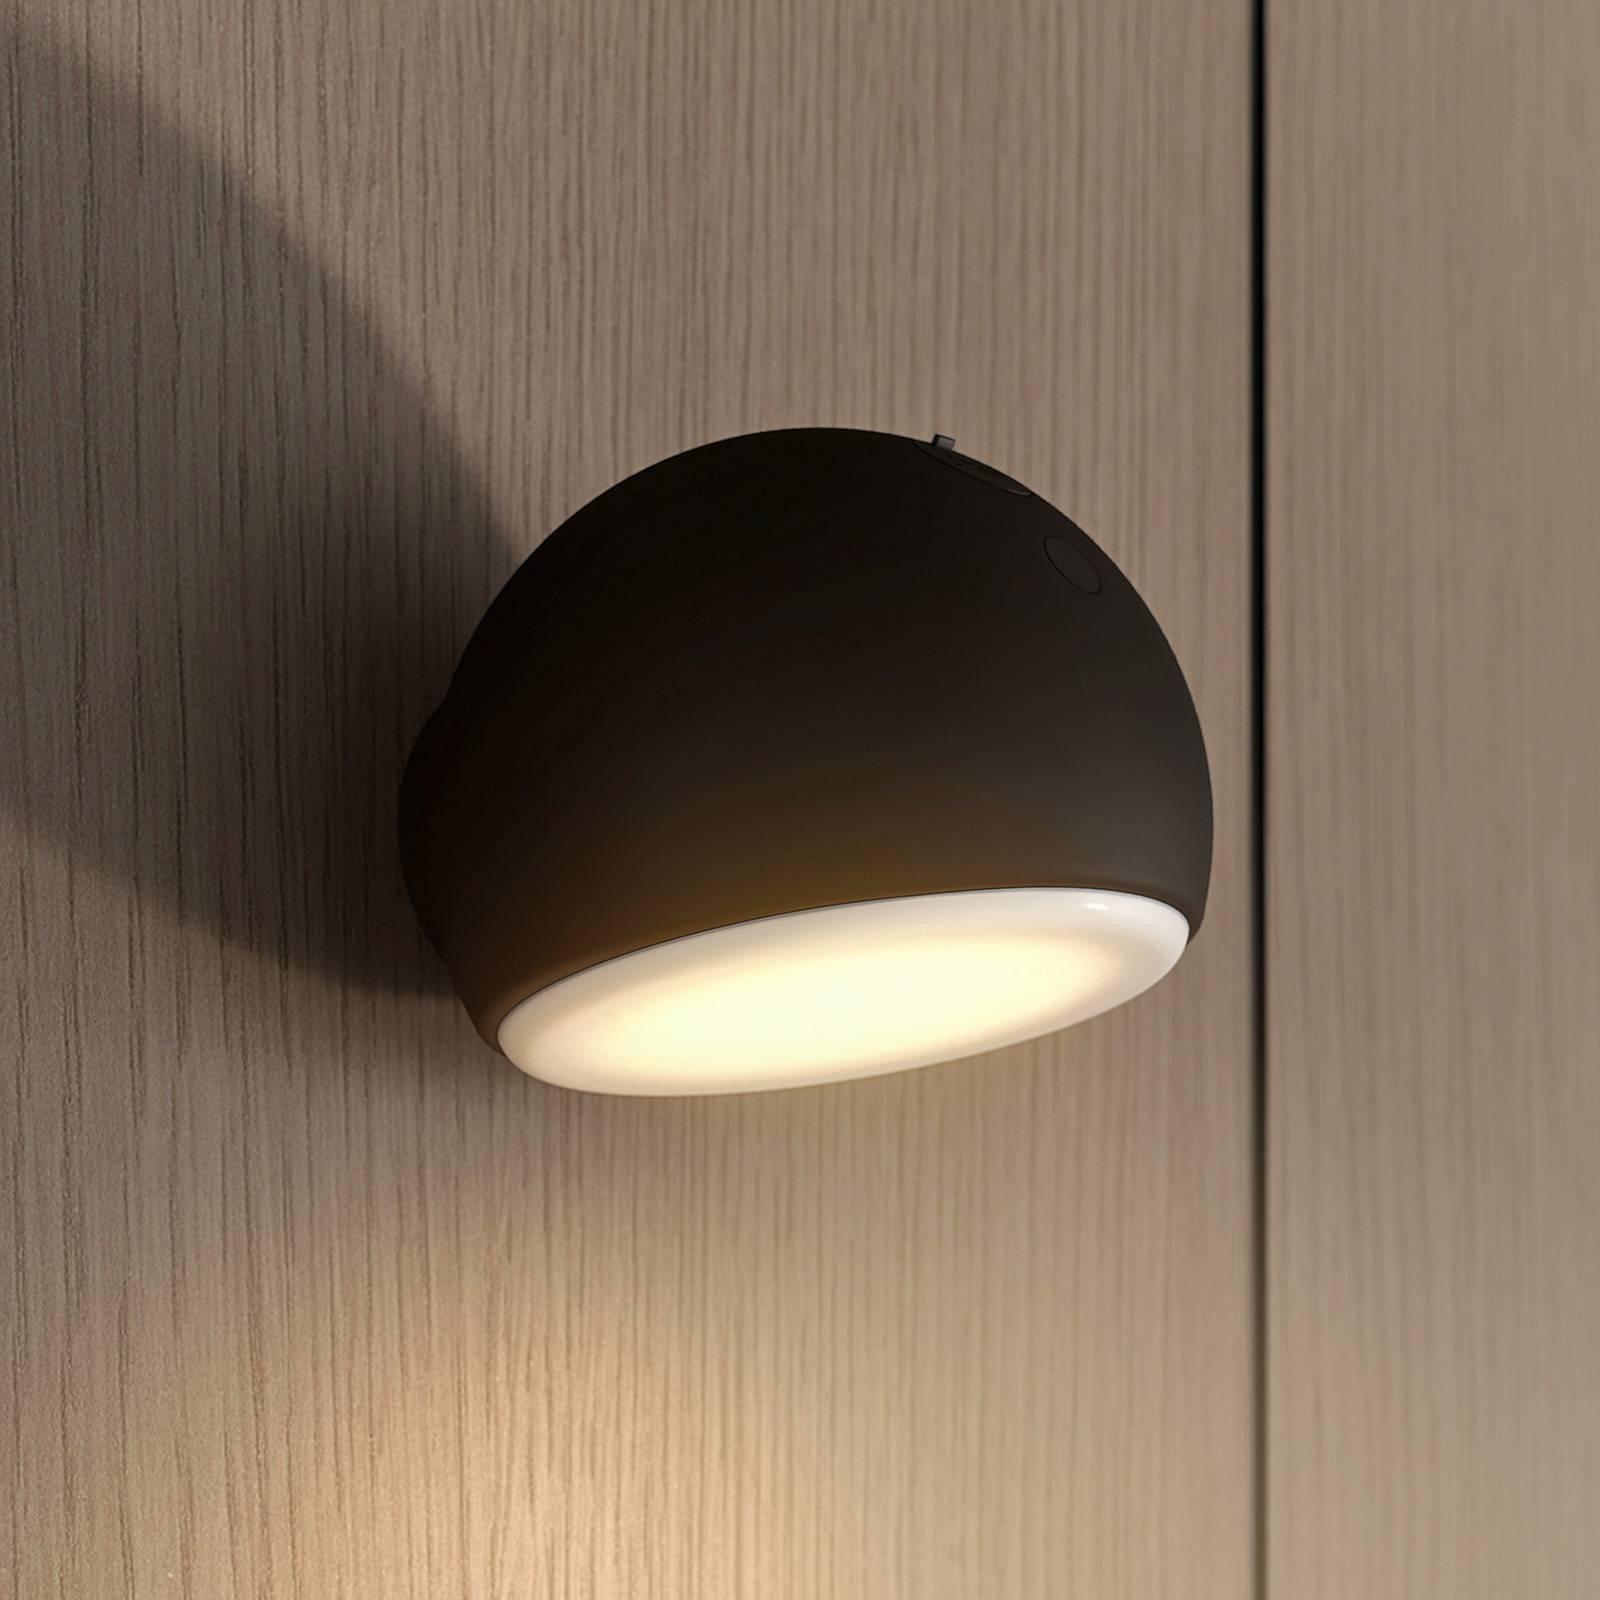 Arcchio Davir -LED-seinävalaisin, akku, musta